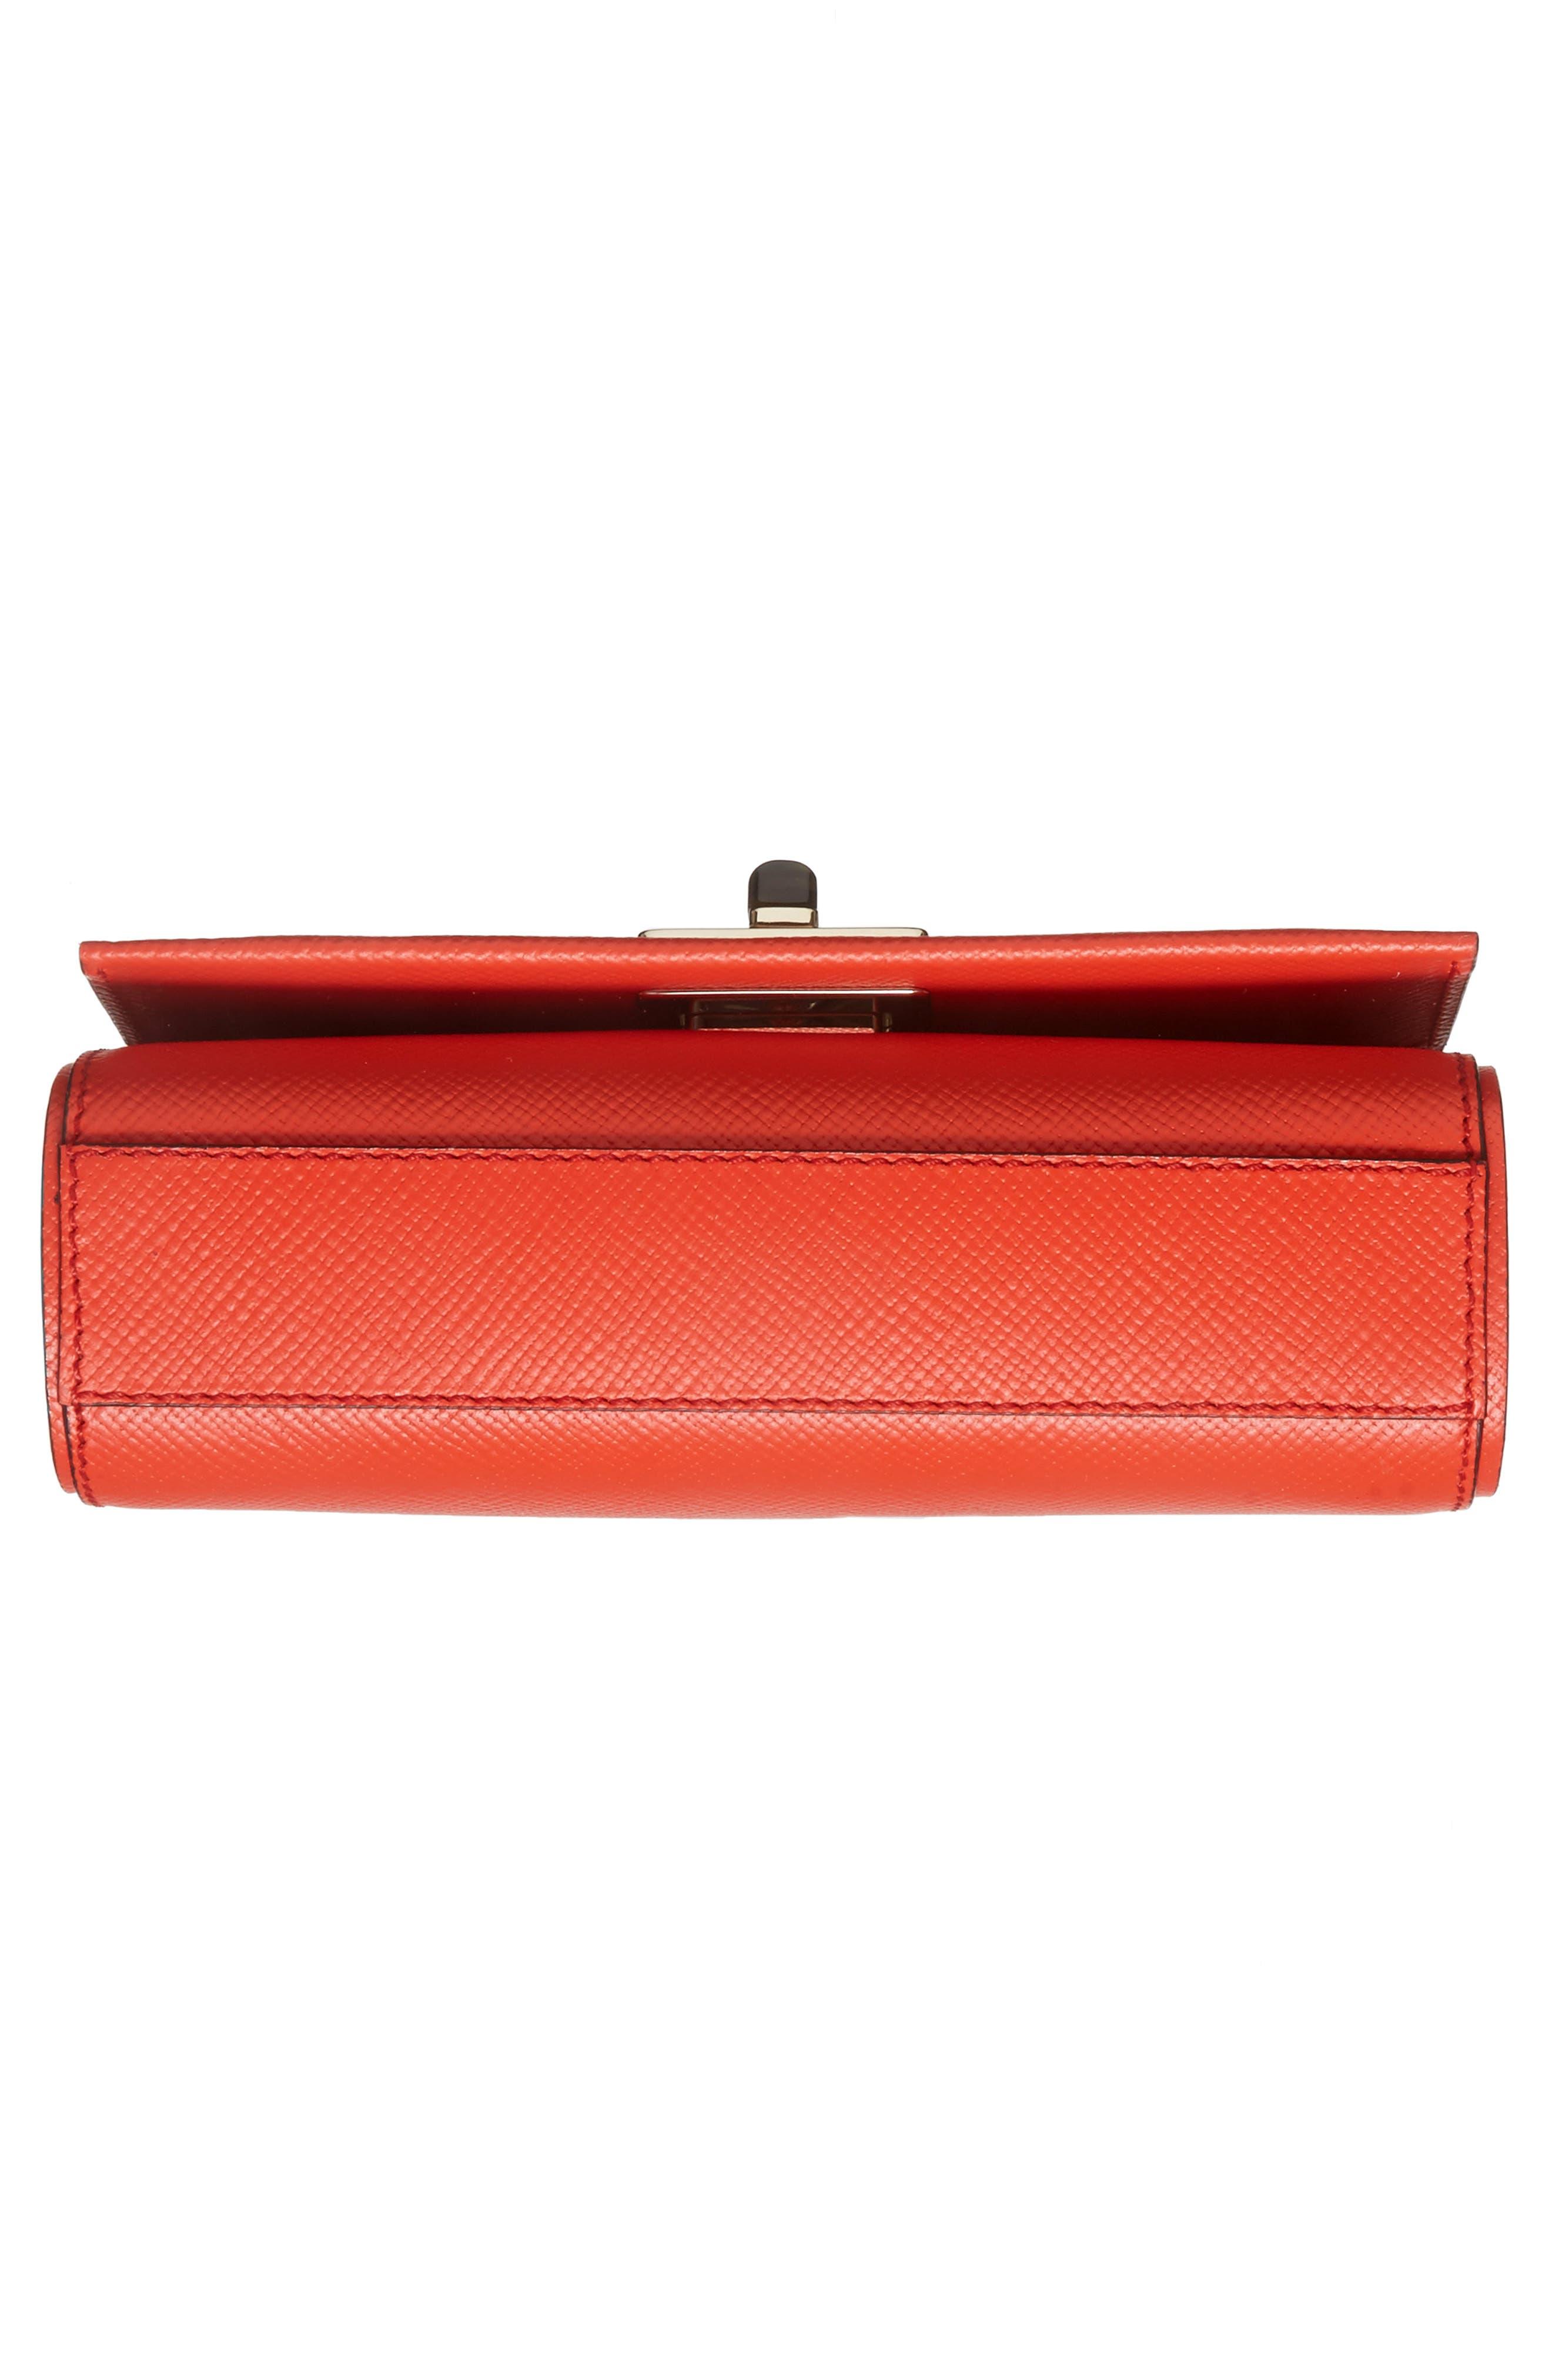 Mini Ilenea Leather Crossbody Bag,                             Alternate thumbnail 6, color,                             Coral Red